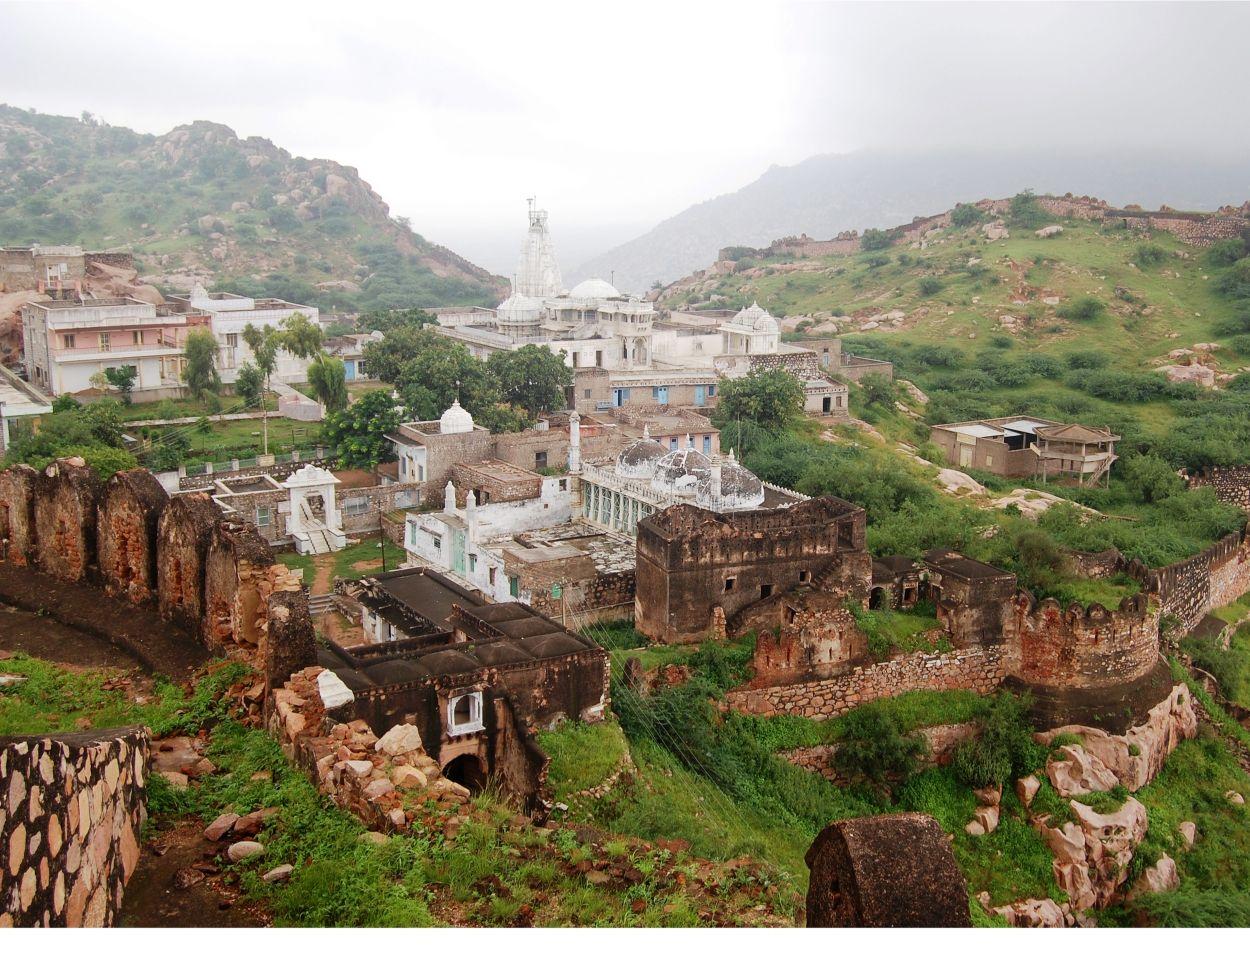 Jalore Fort  Rajasthan India 2020